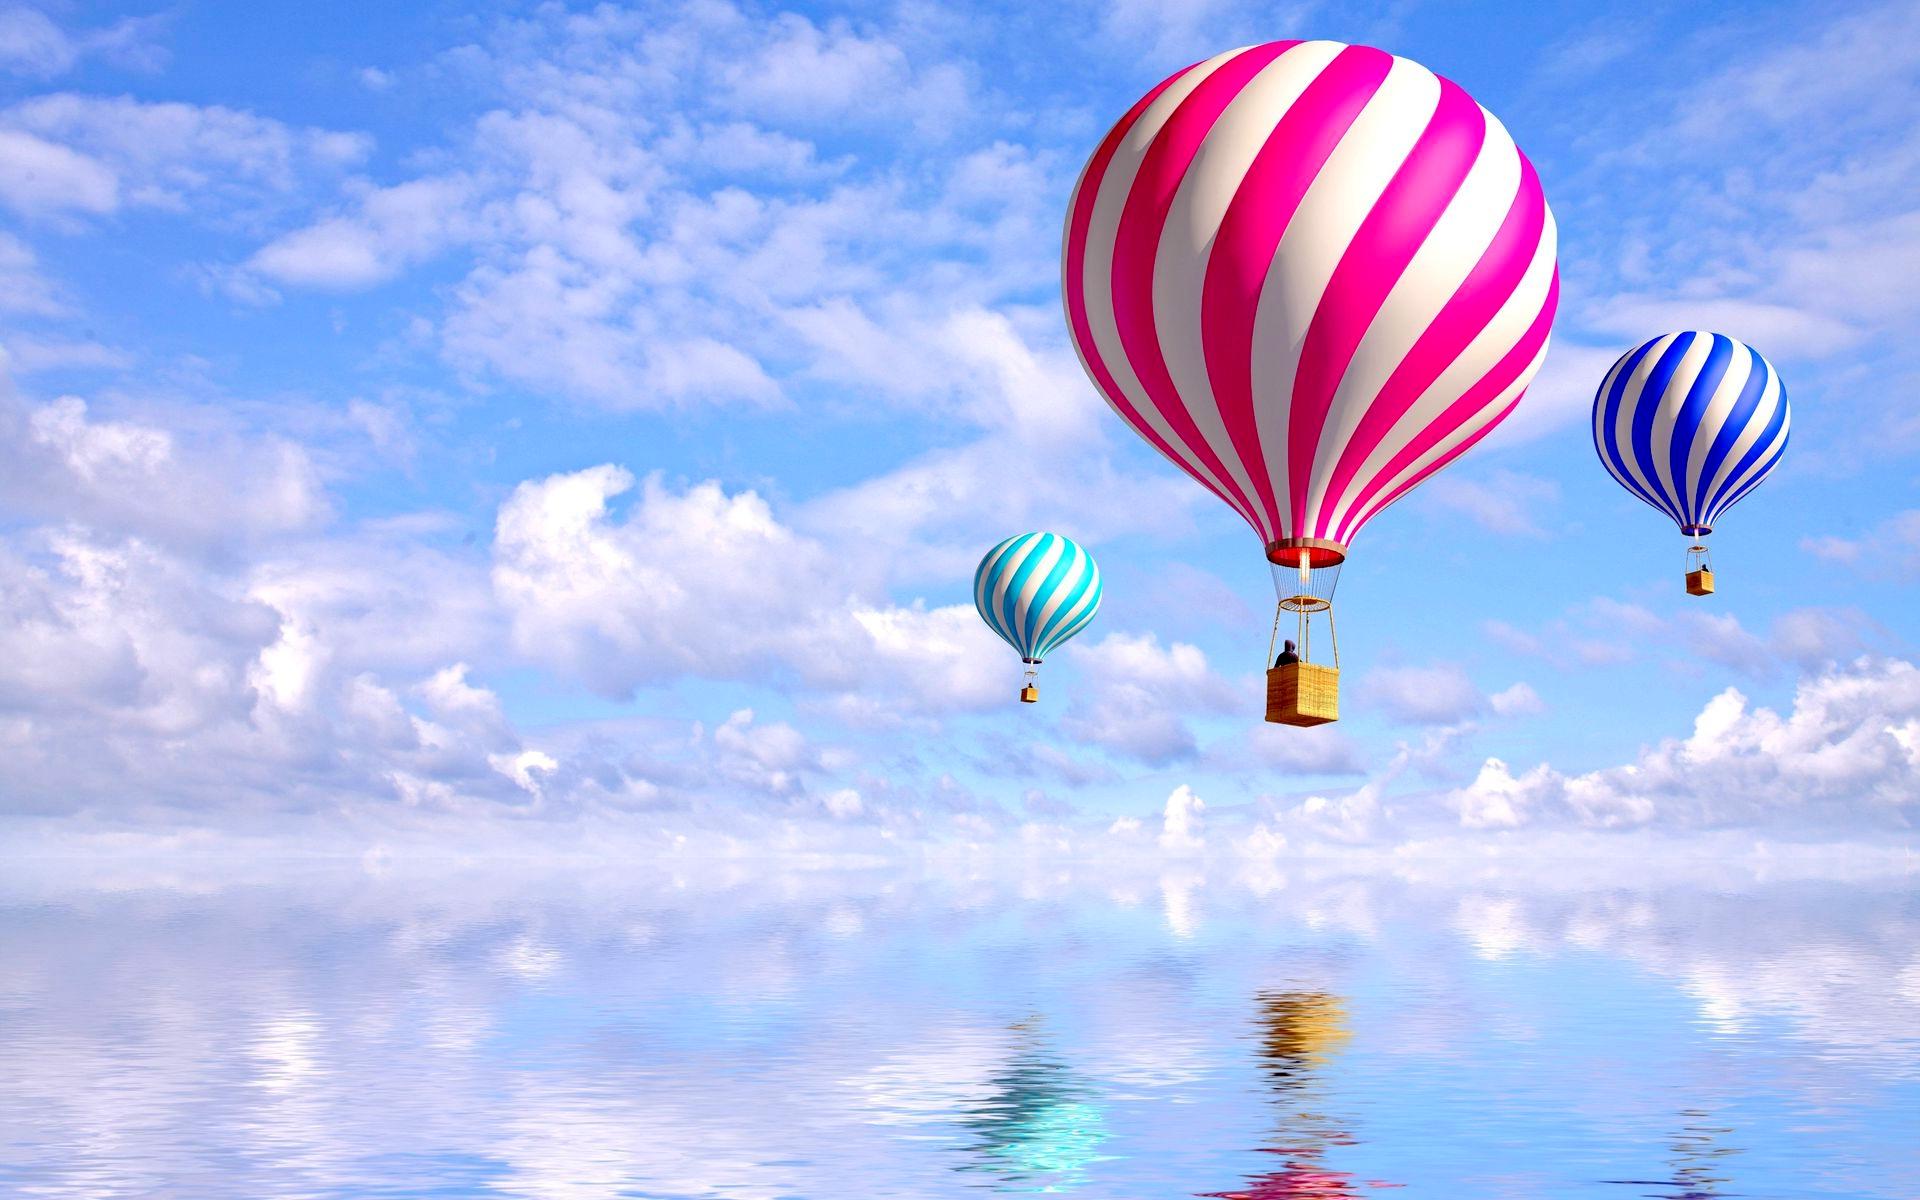 Candy Pop Balloons Air - Candy Pop Balloons Air